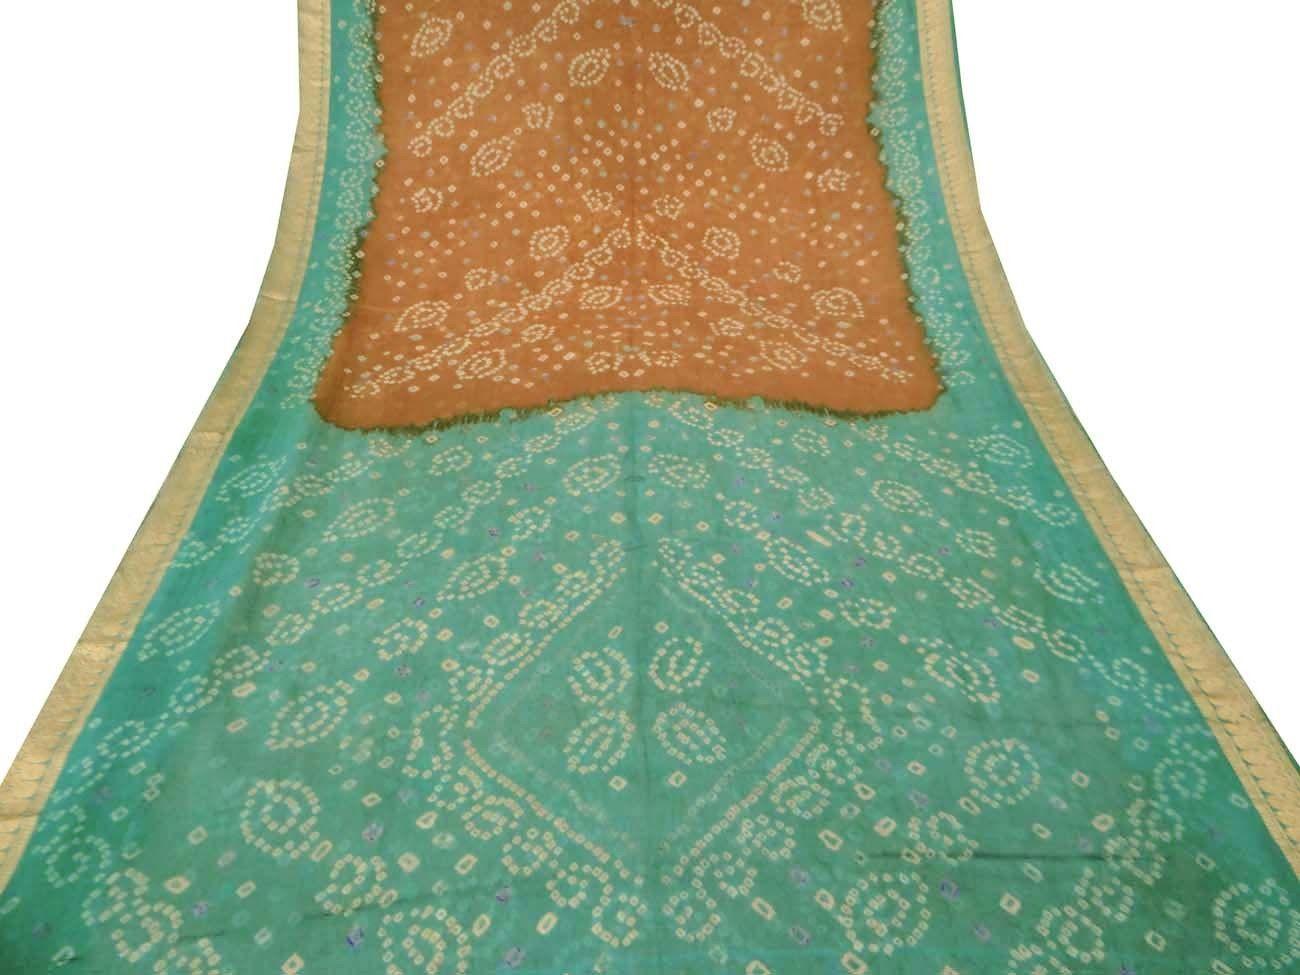 http://www.ebay.co.uk/itm/Pure-Silk-Vintage-Saree-Fabric-India ...